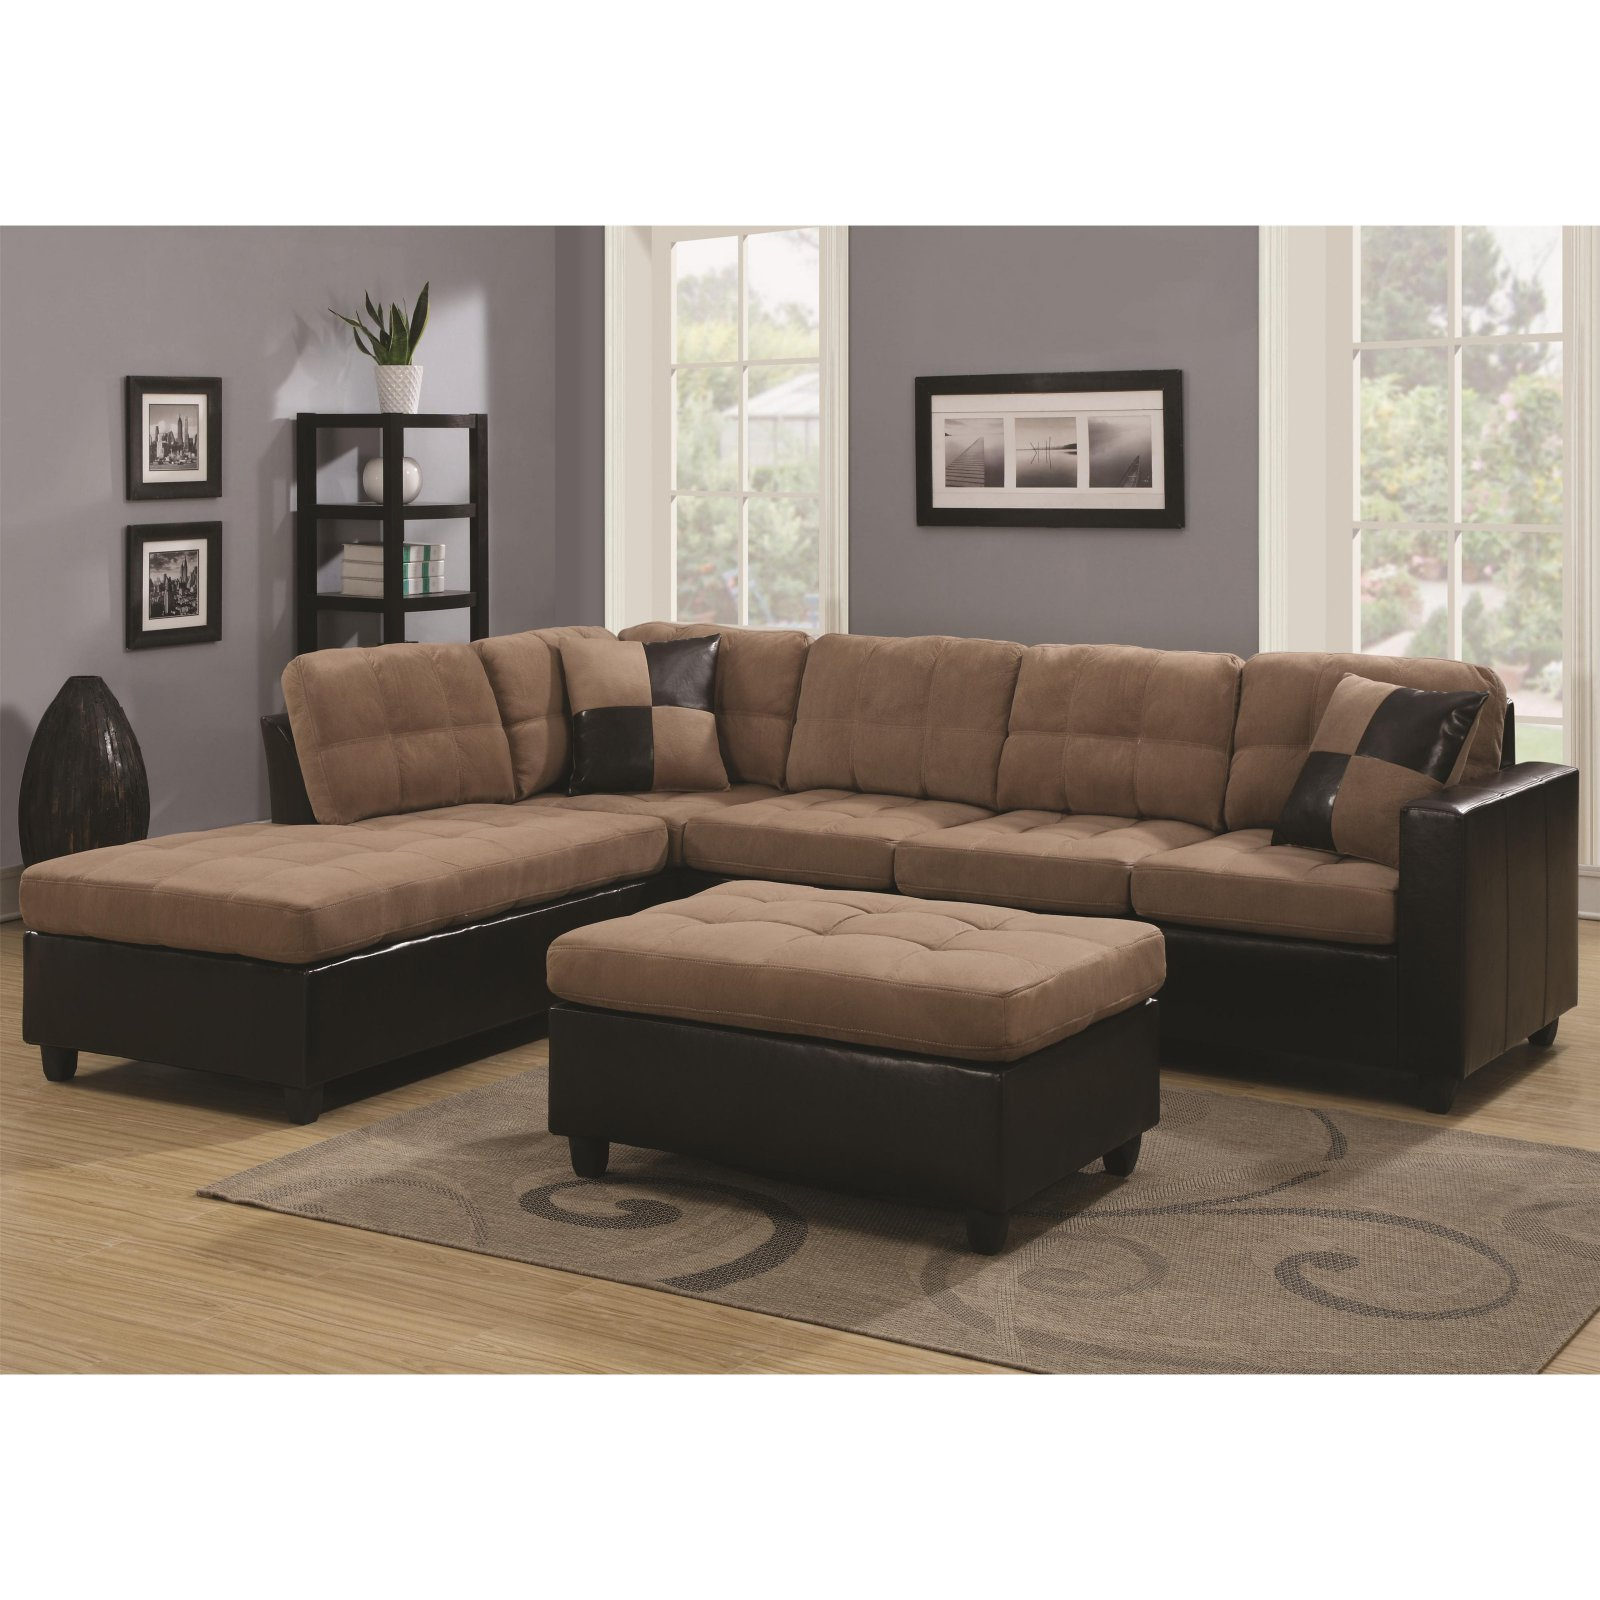 Coaster furniture mallory sectional walmart com